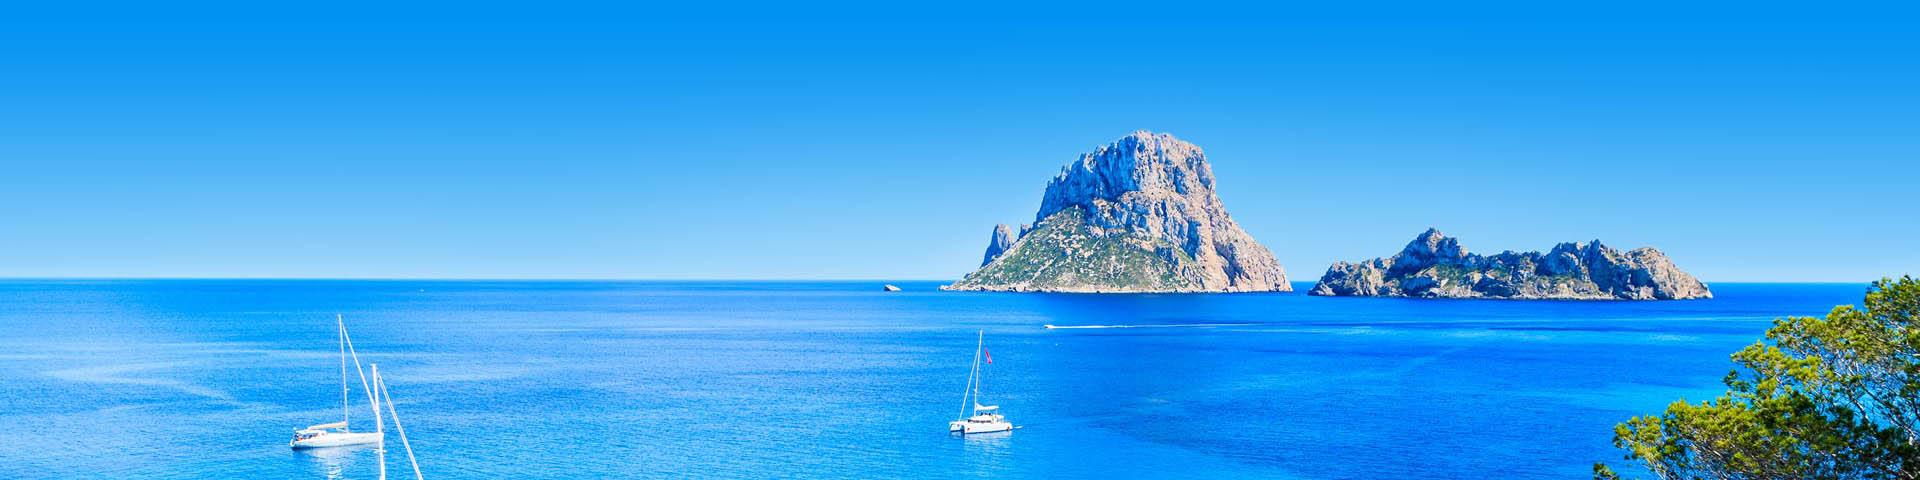 Rotsen en bootjes in de zee bij Ibiza